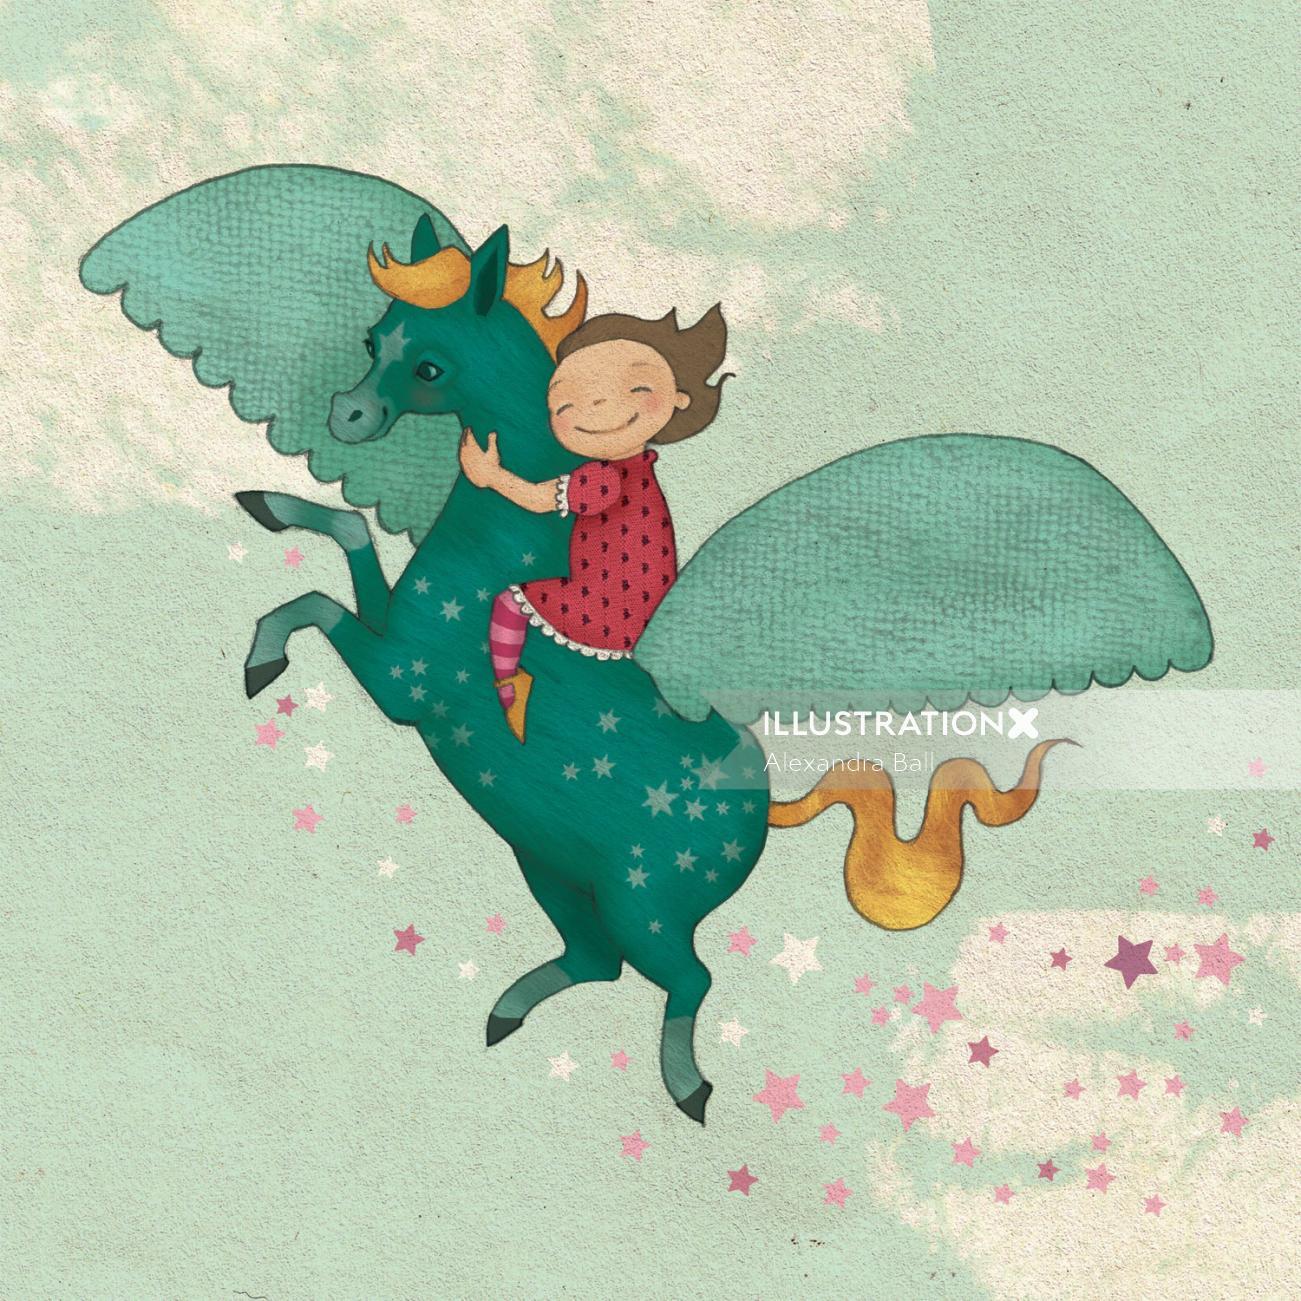 fantasy girl riding on the back of pegasus mixed media